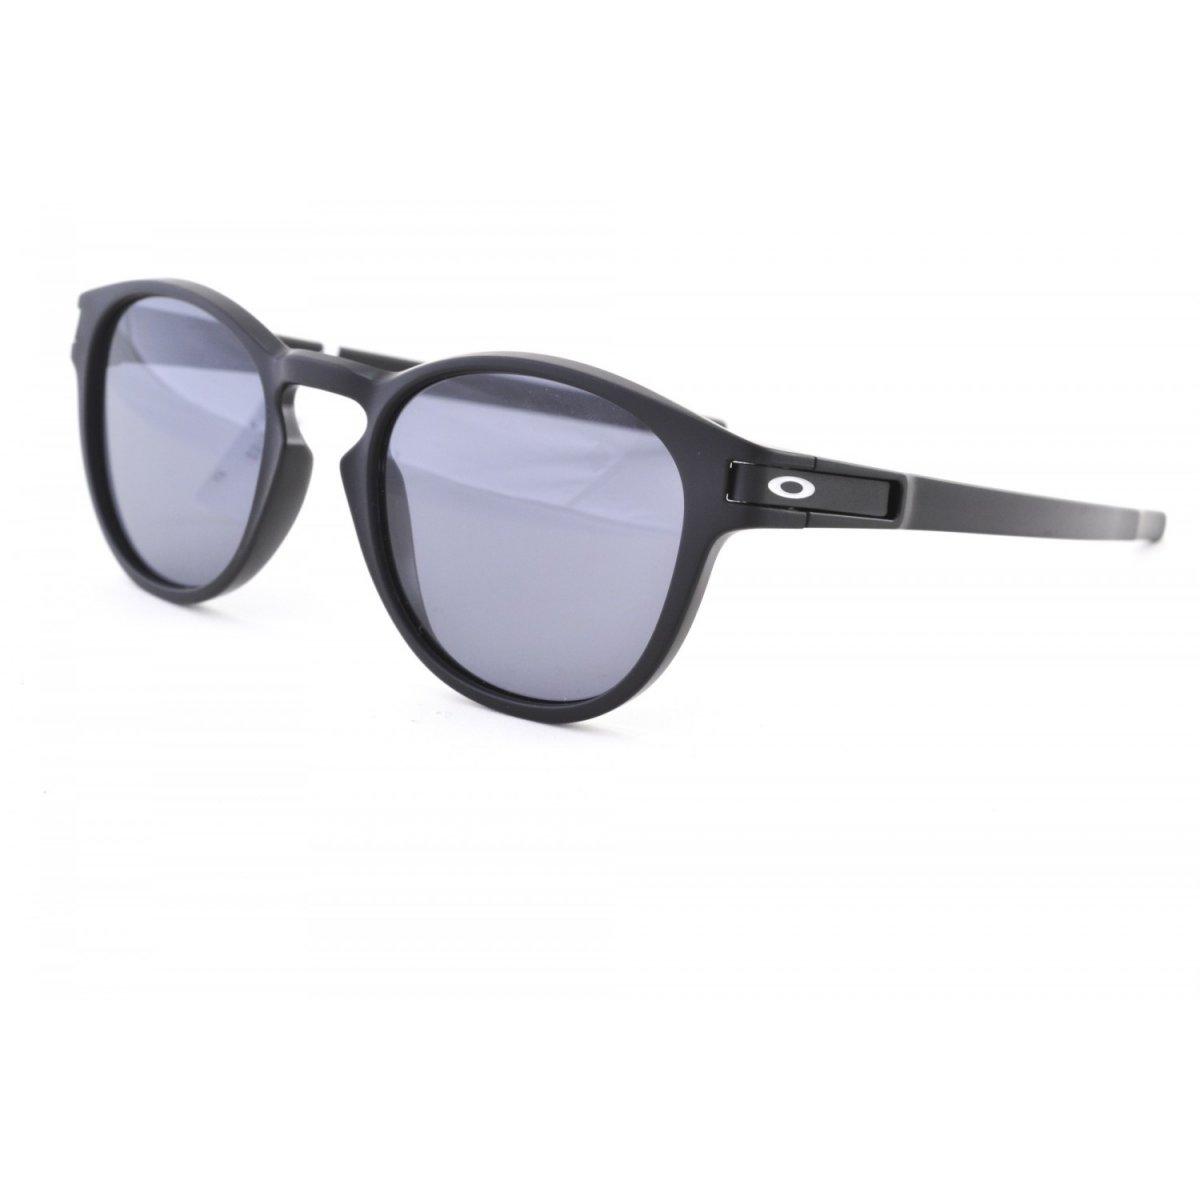 32bcf322385b3 Oculos Oakley Preço – Southern California Weather Force